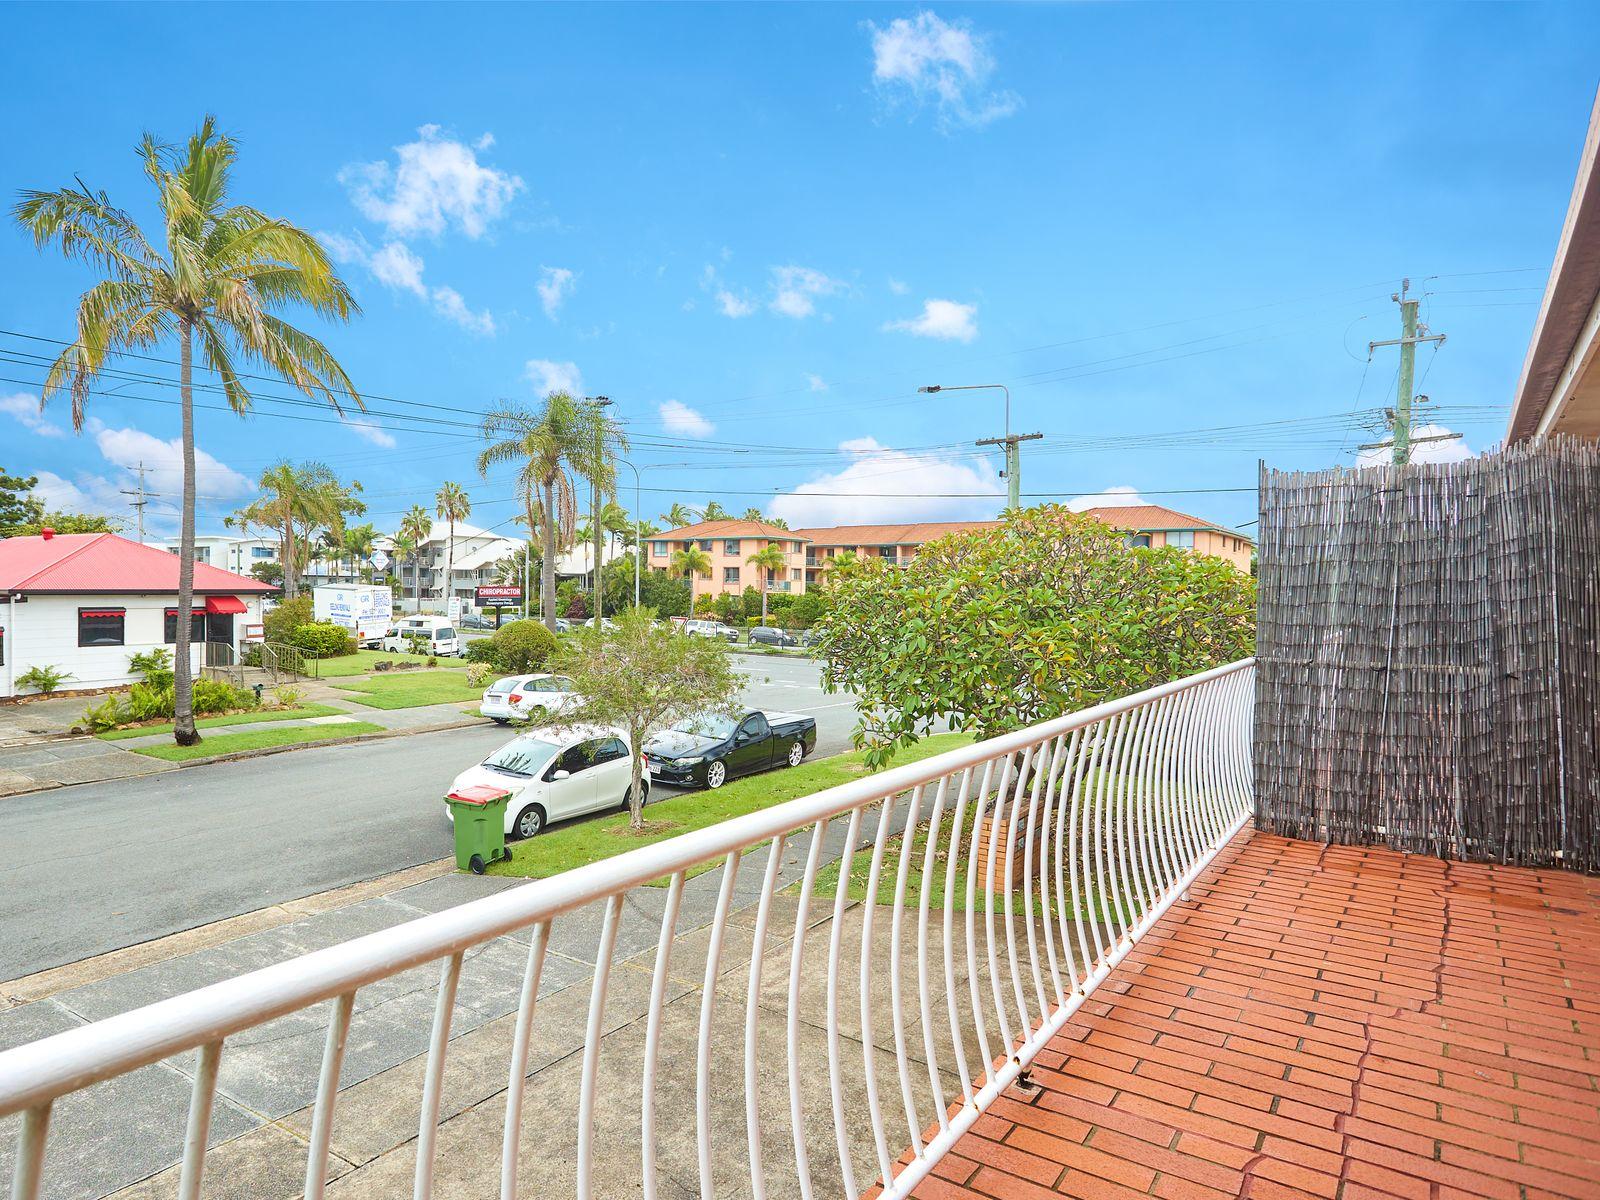 5/43 Arthur Street, Mermaid Beach, QLD 4218